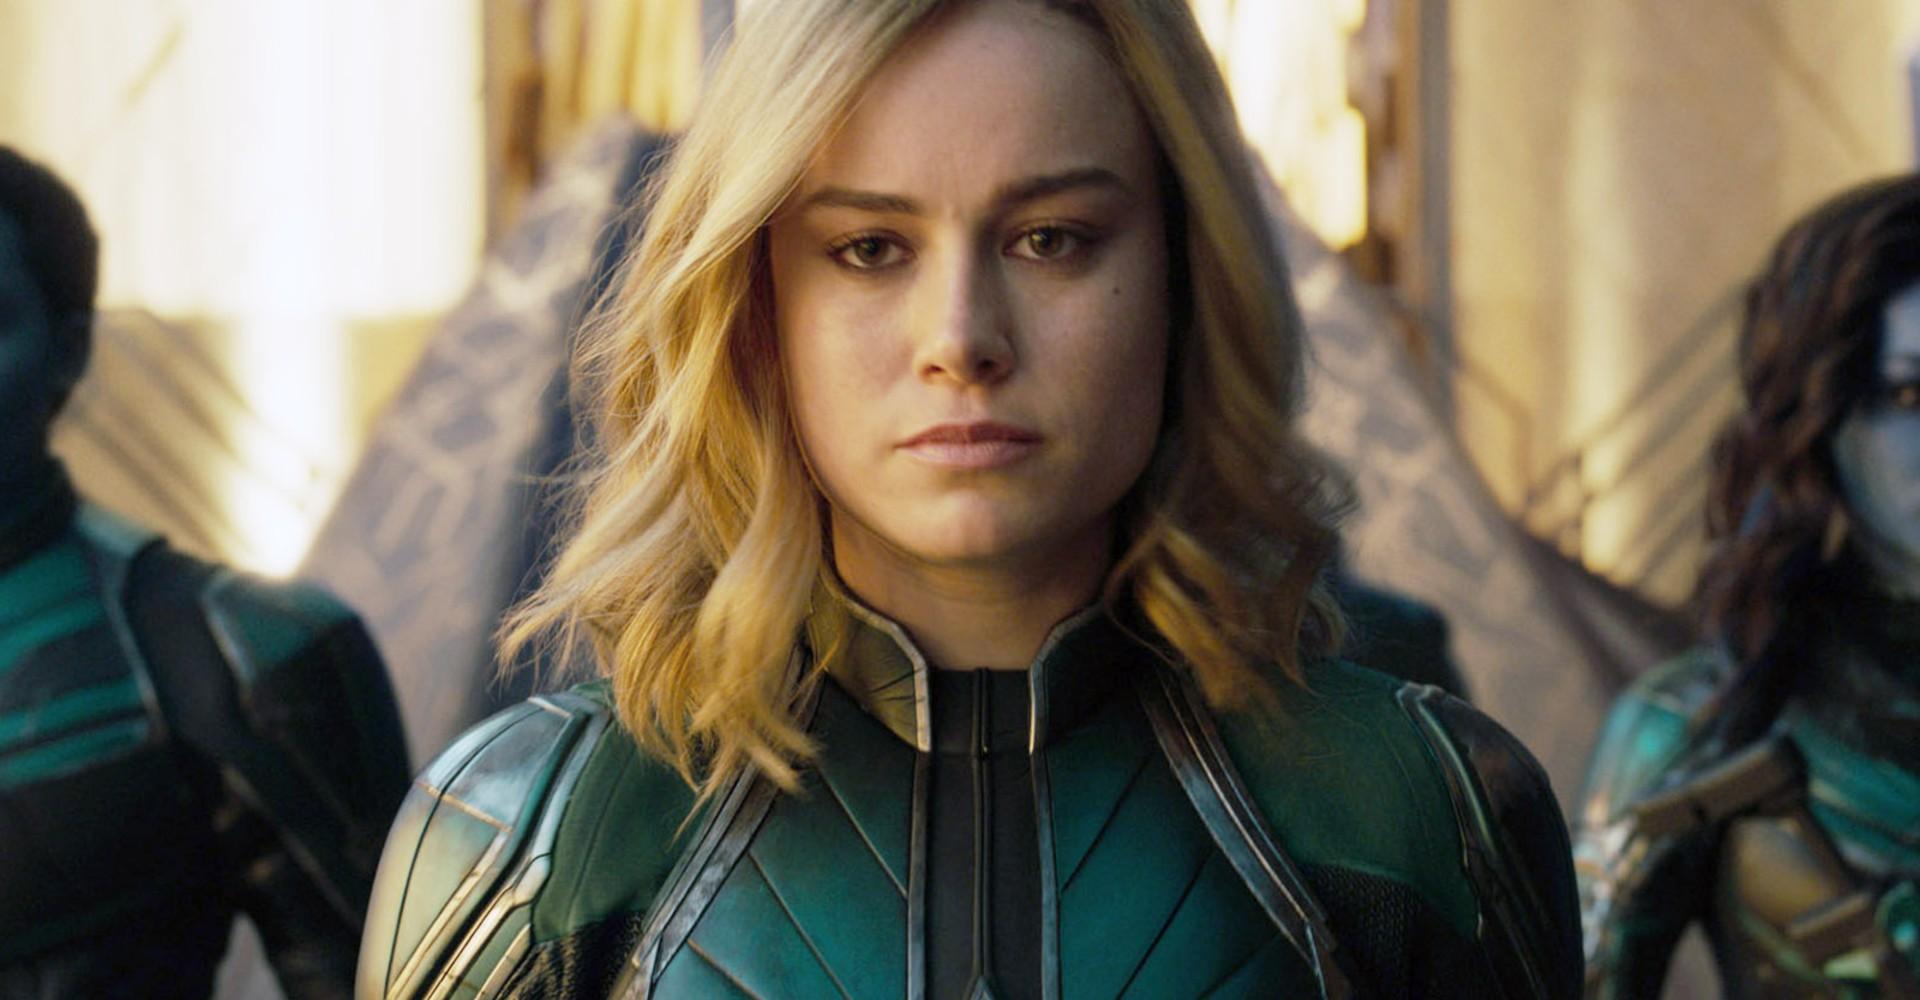 Brie Larson in Captain Marvel (MCU Phase 4)